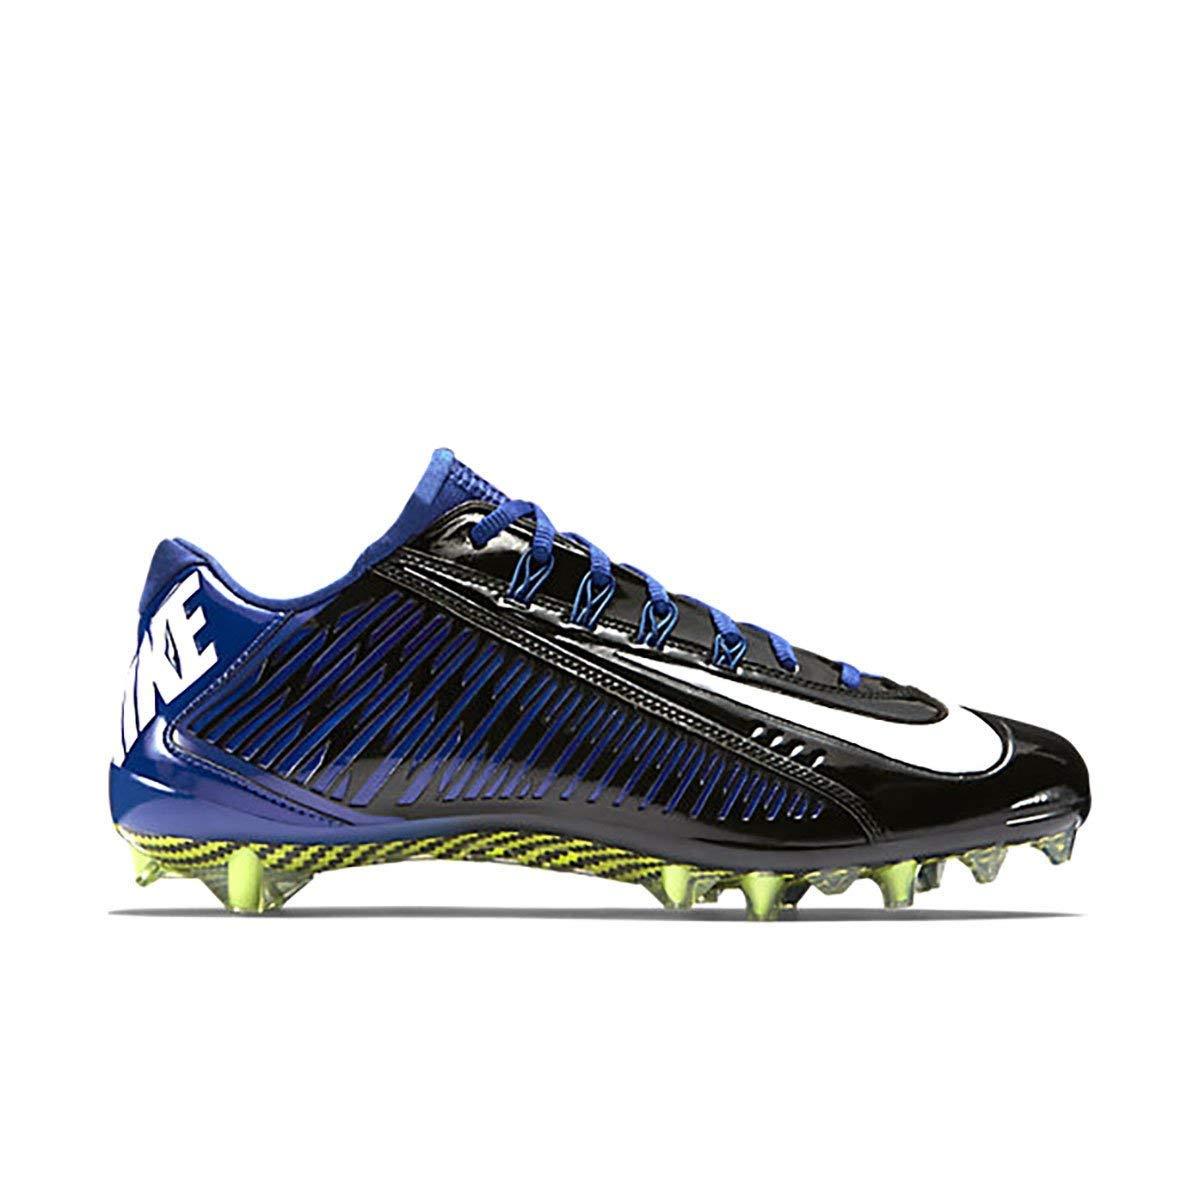 Nike Vapor Carbon Elite Football Cleats